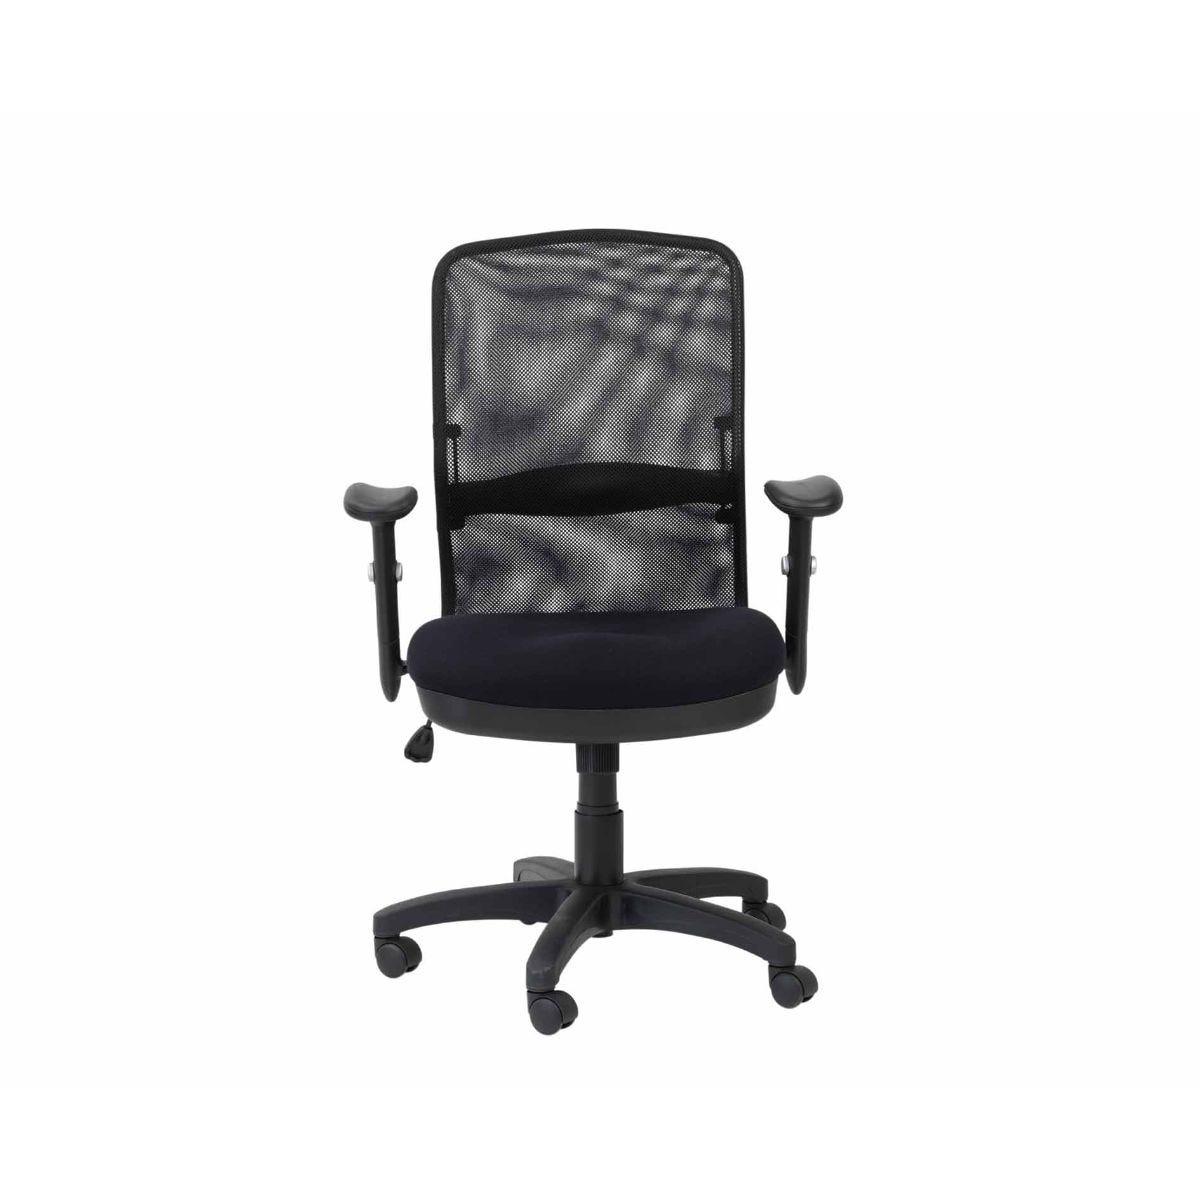 Alphason Dakota Mesh Back Managerial Office Chair, Black